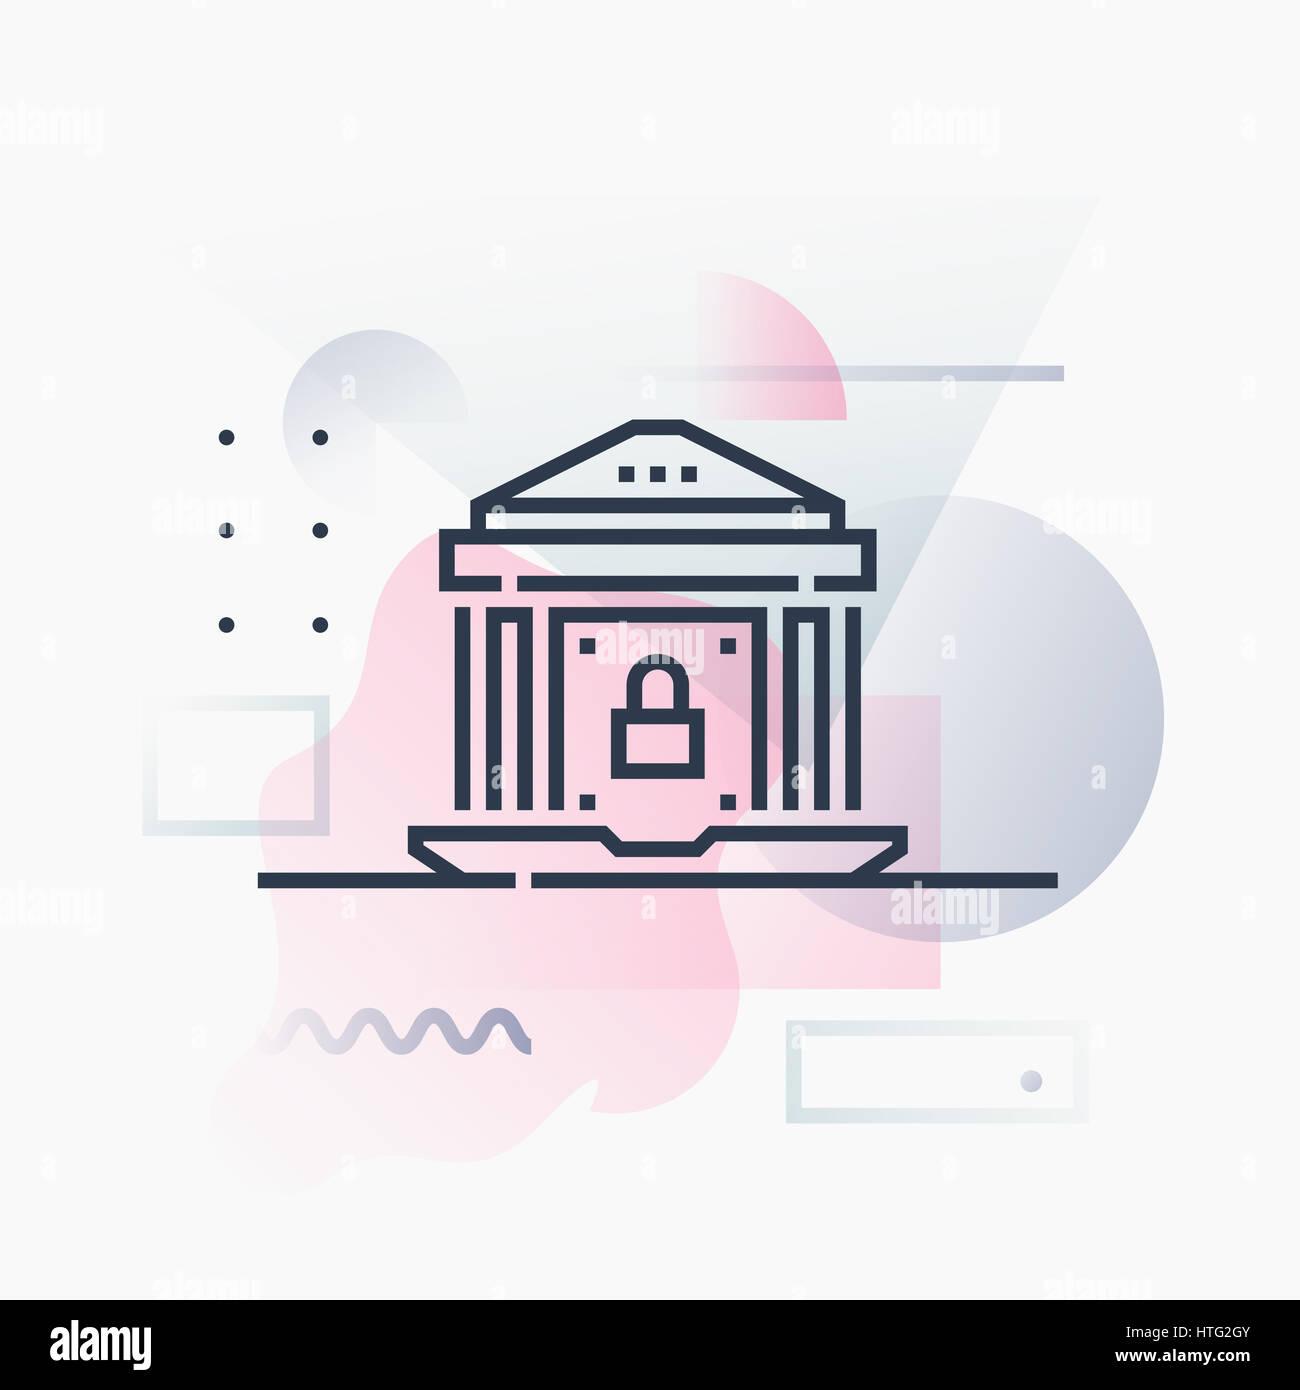 online finances